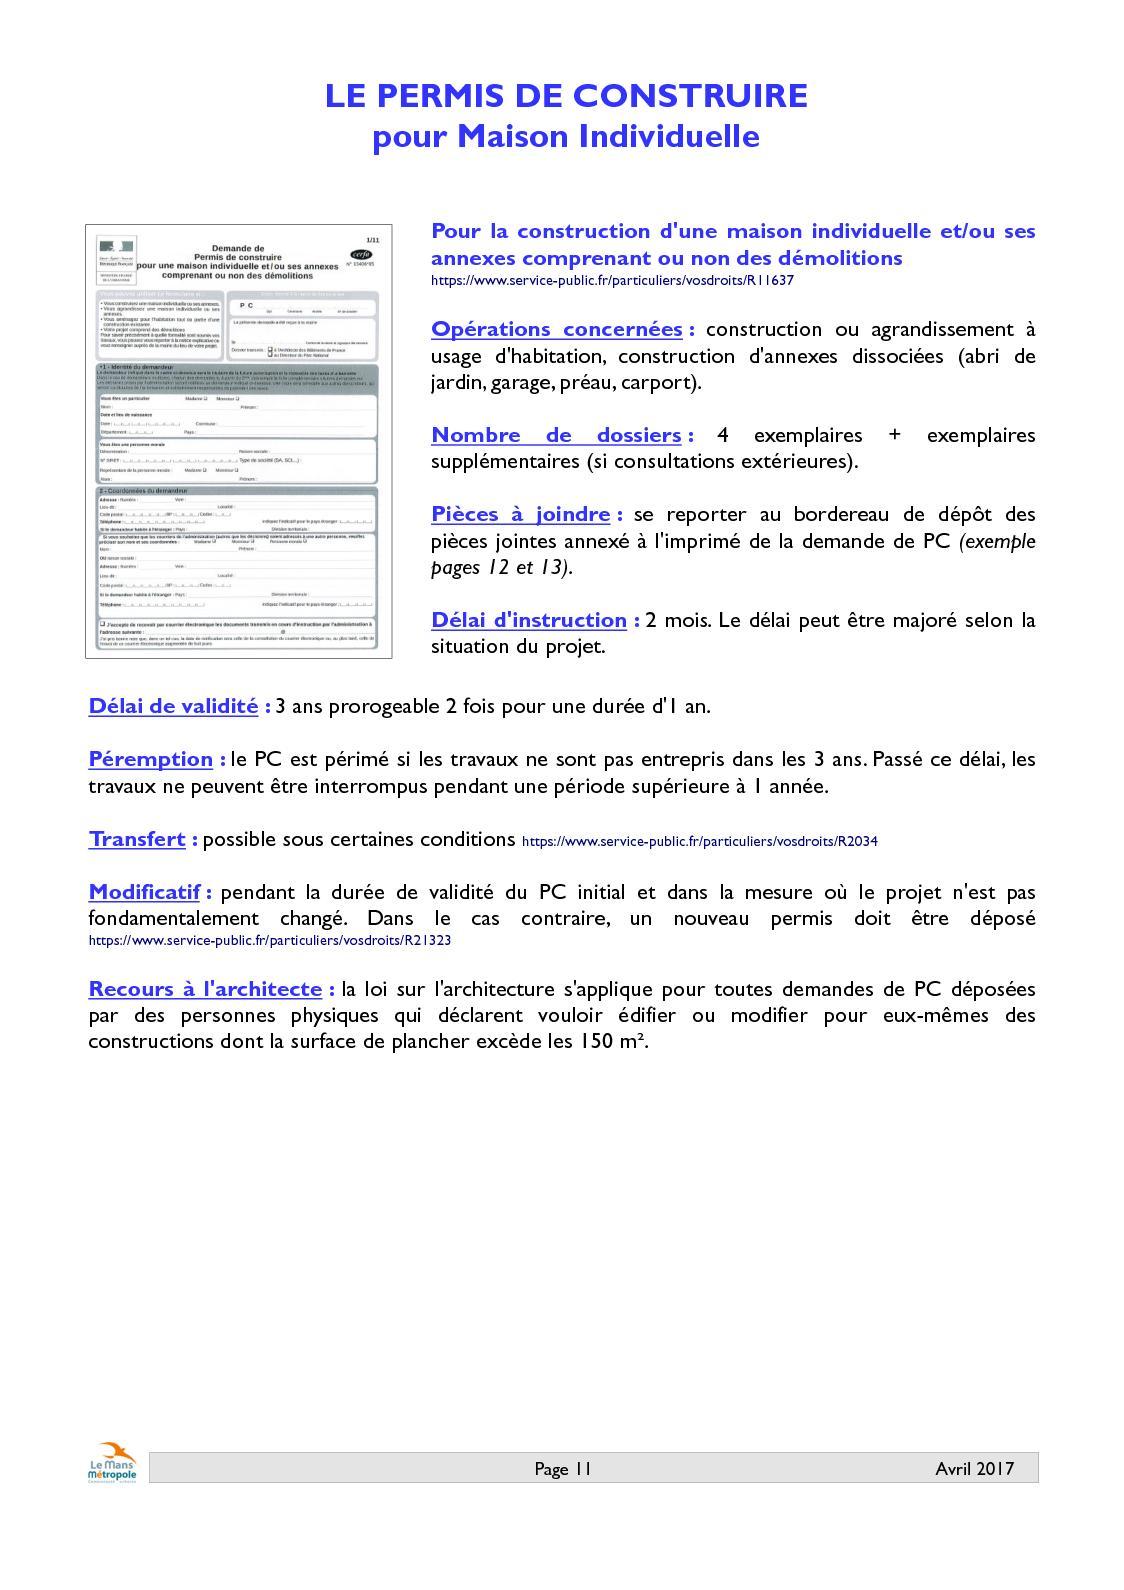 Abri De Jardin Permis De Construire Luxe Guide Pratique De L Urbanisme Calameo Downloader